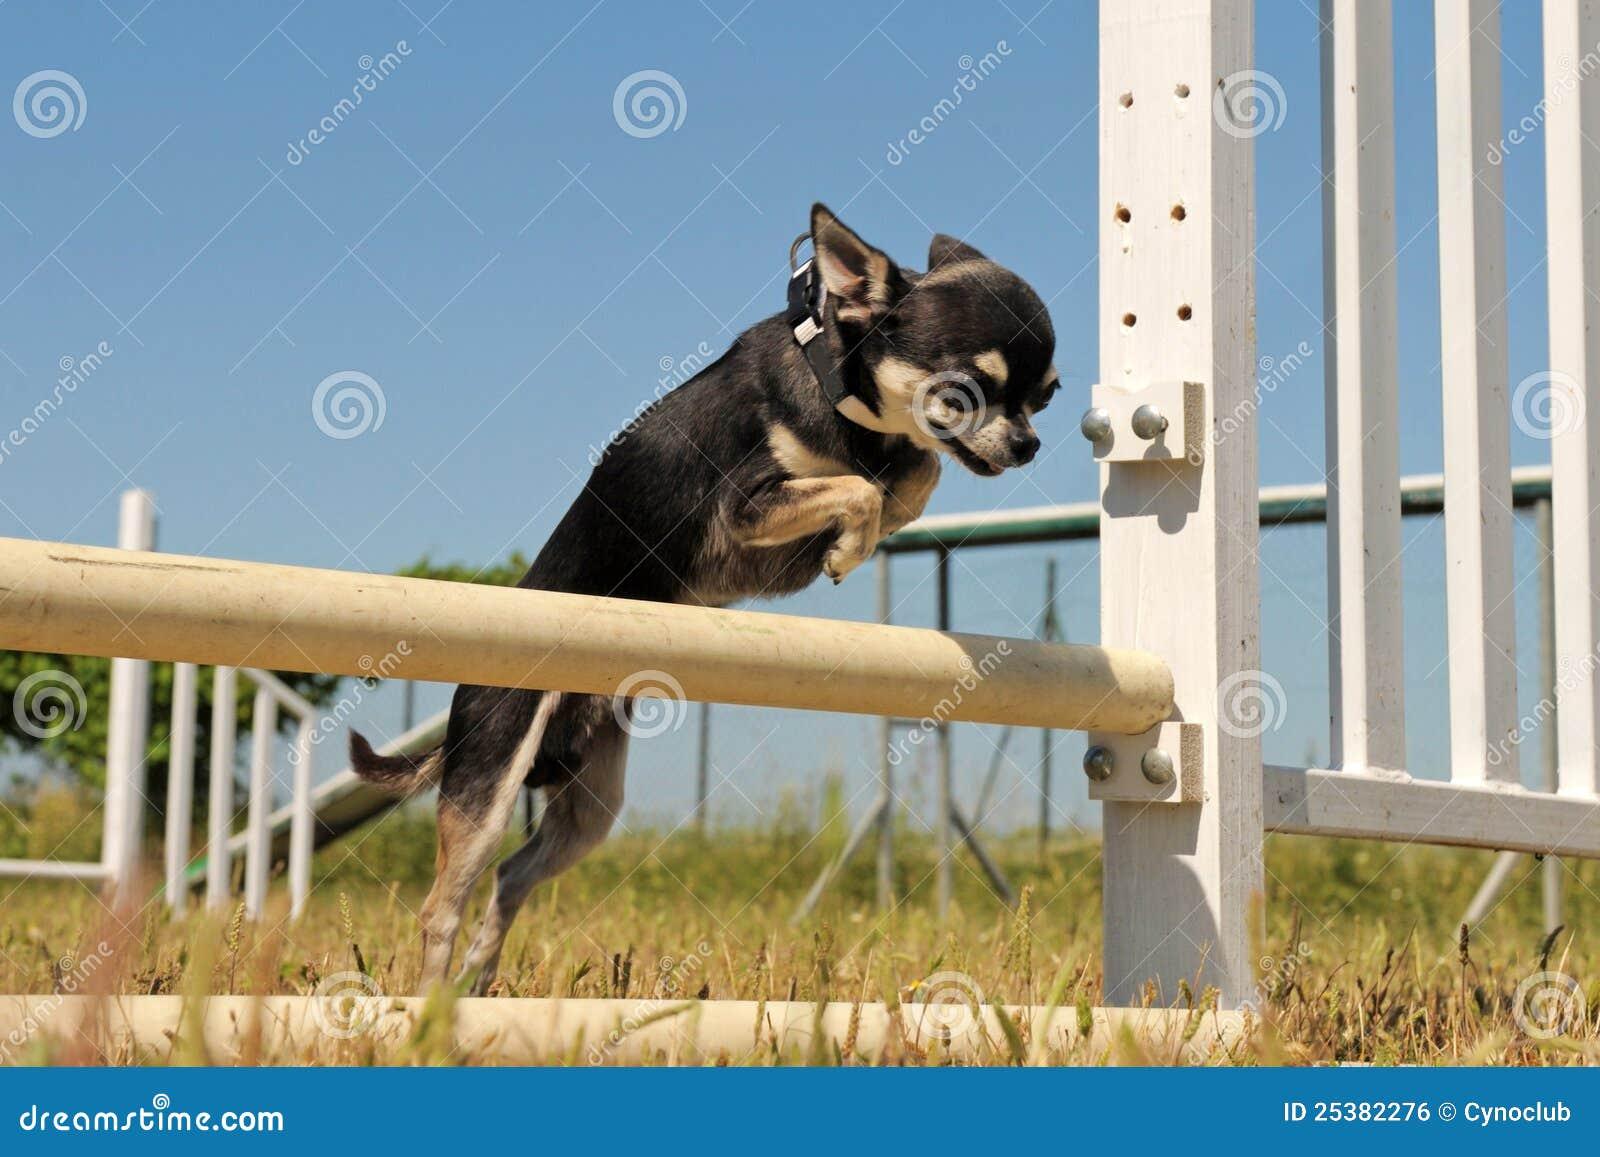 Dog Agility Training Plans